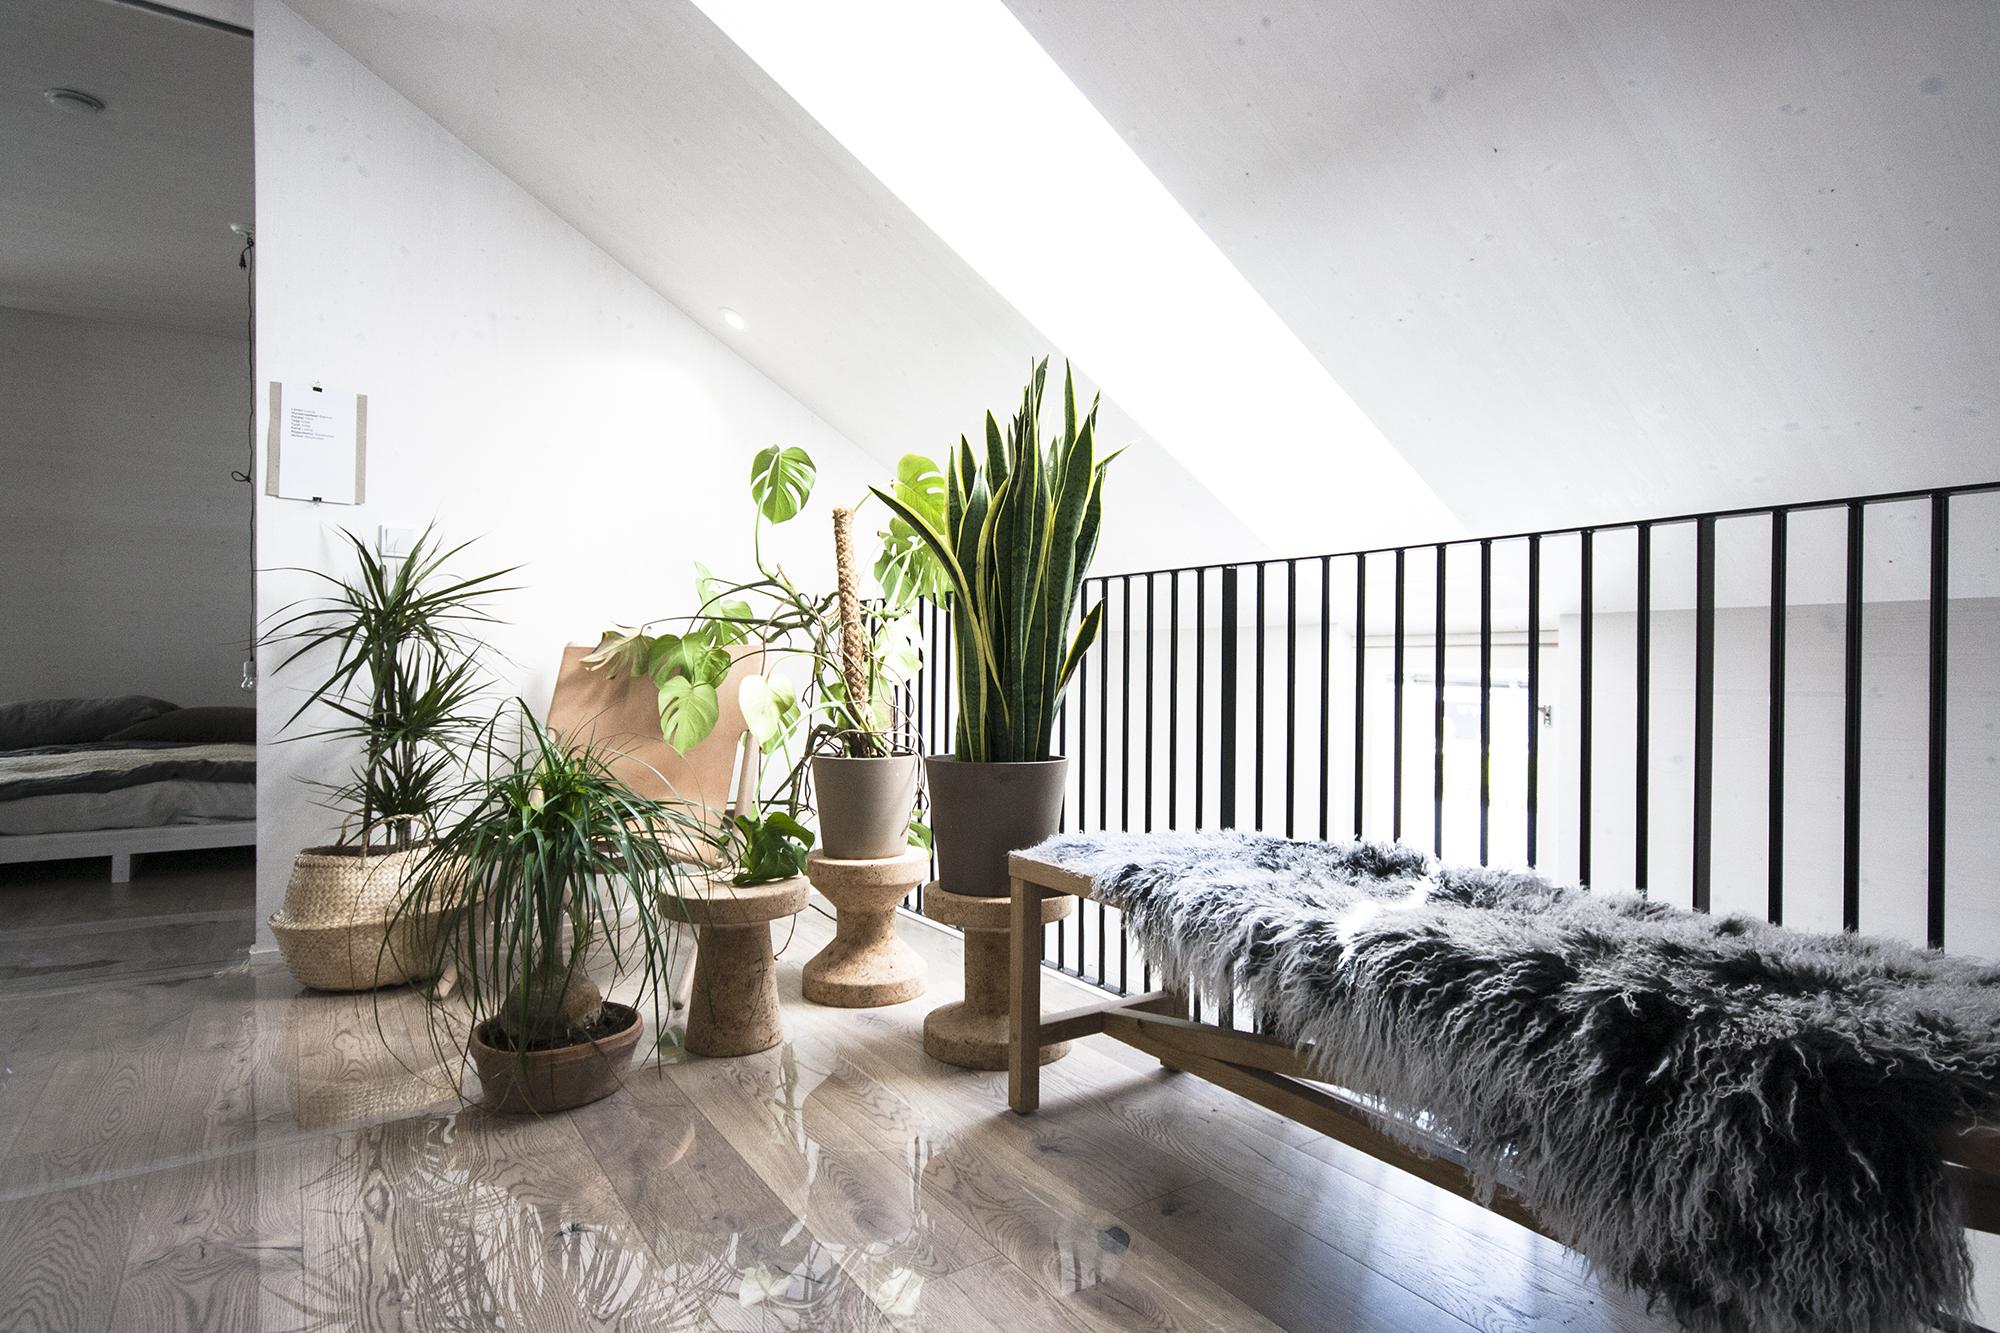 asuntomessut vivola viherkasvit